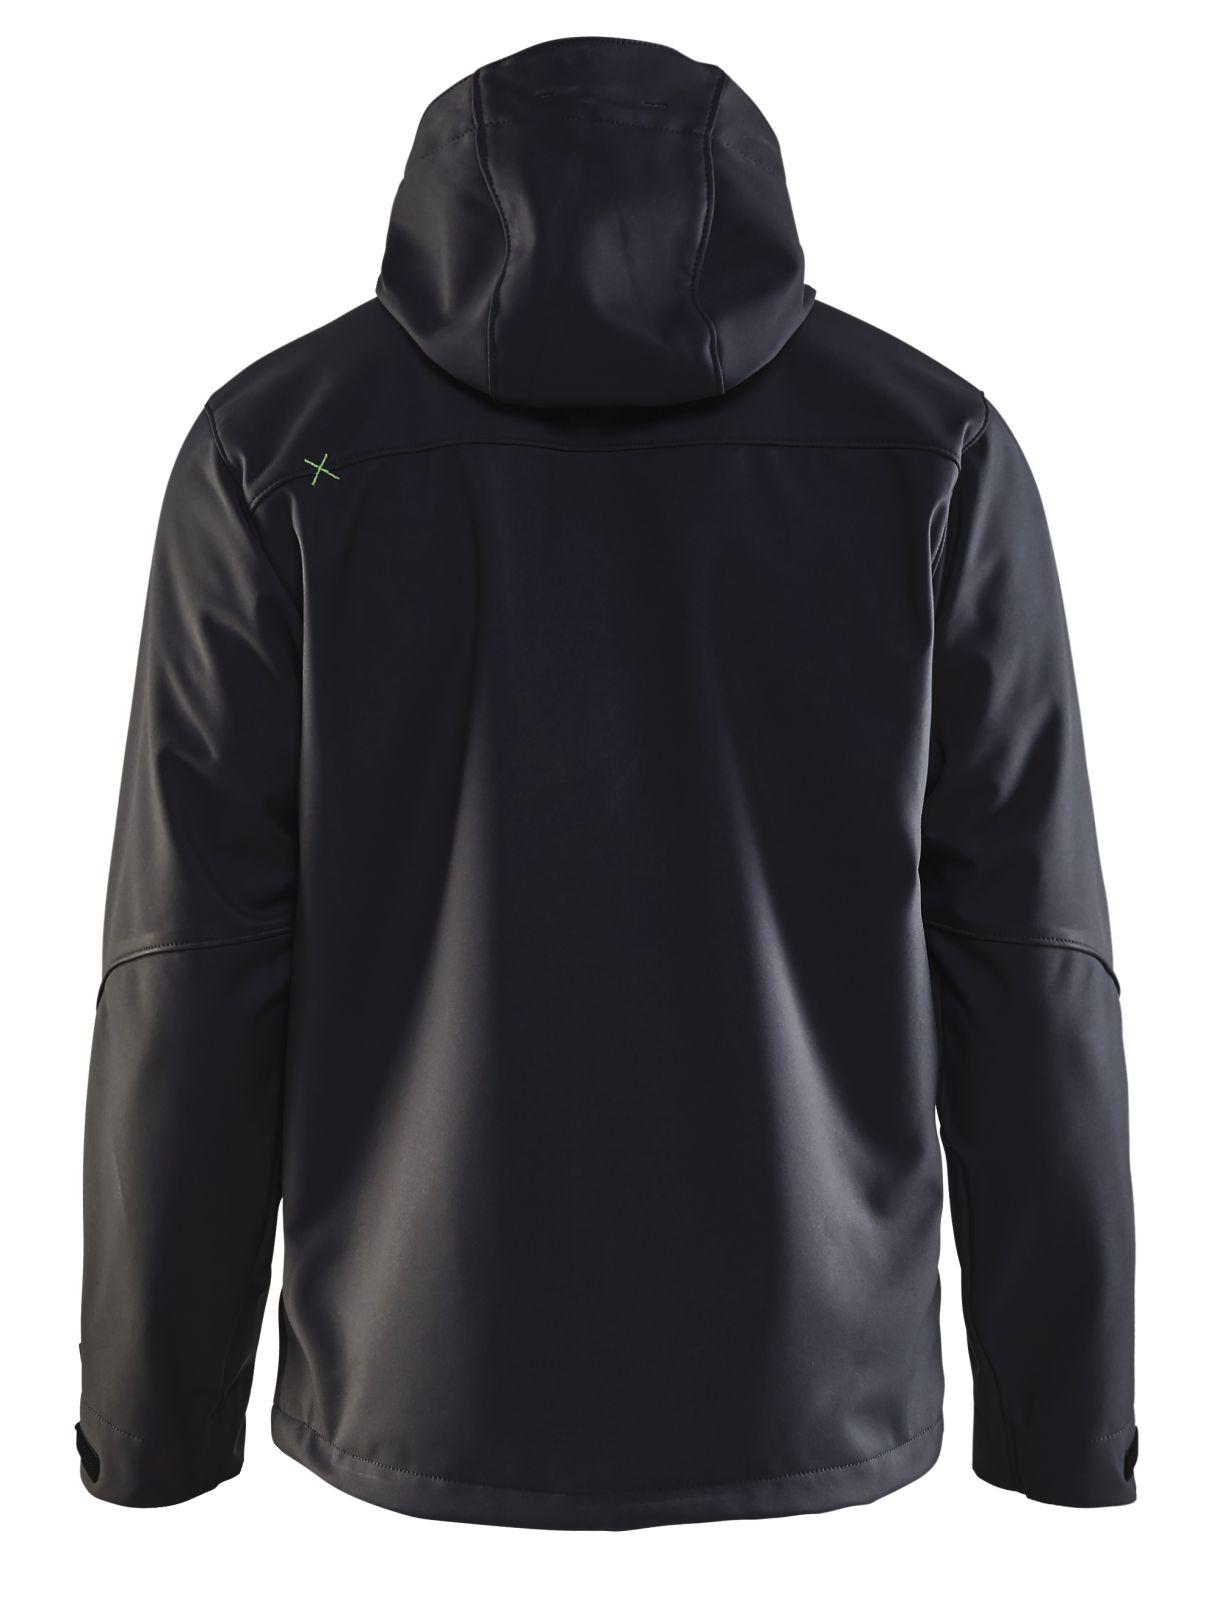 Blaklader Softshell jacks 49492517 zwart-groen(9942)